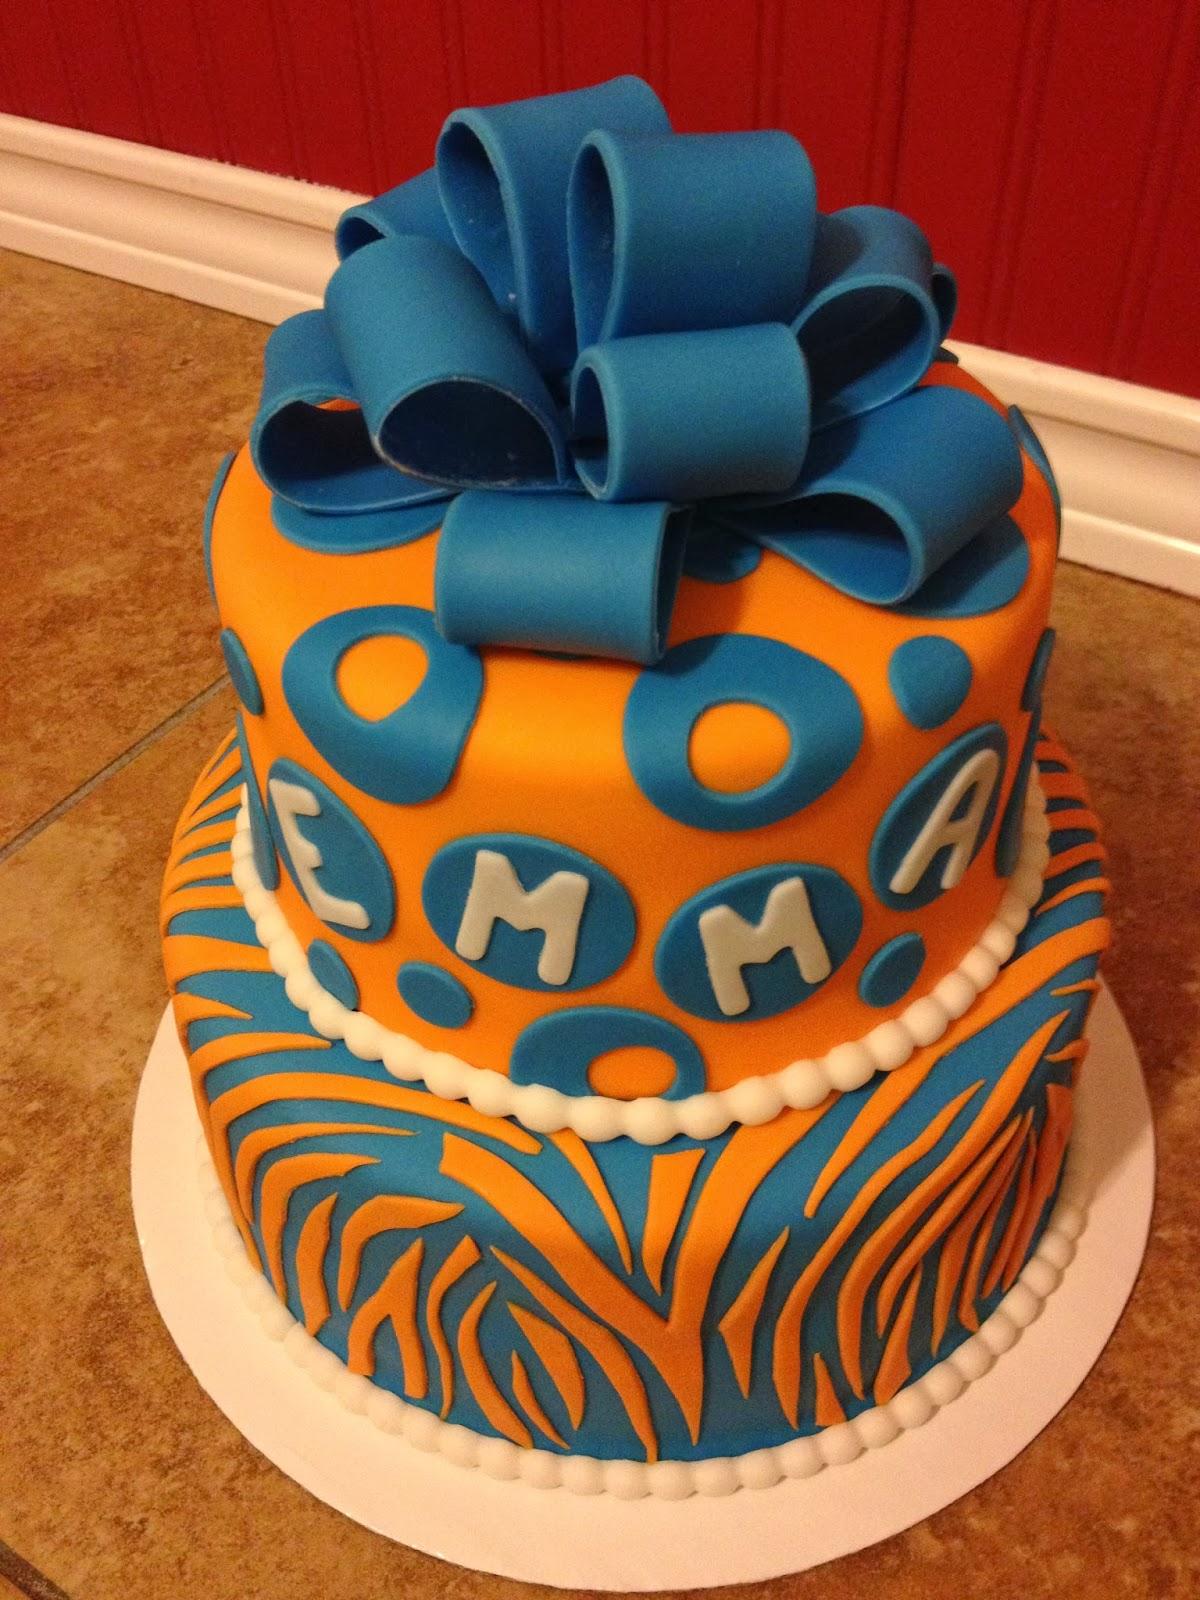 Sugar Love Cake Design Blue And Orange Zebra Stripes